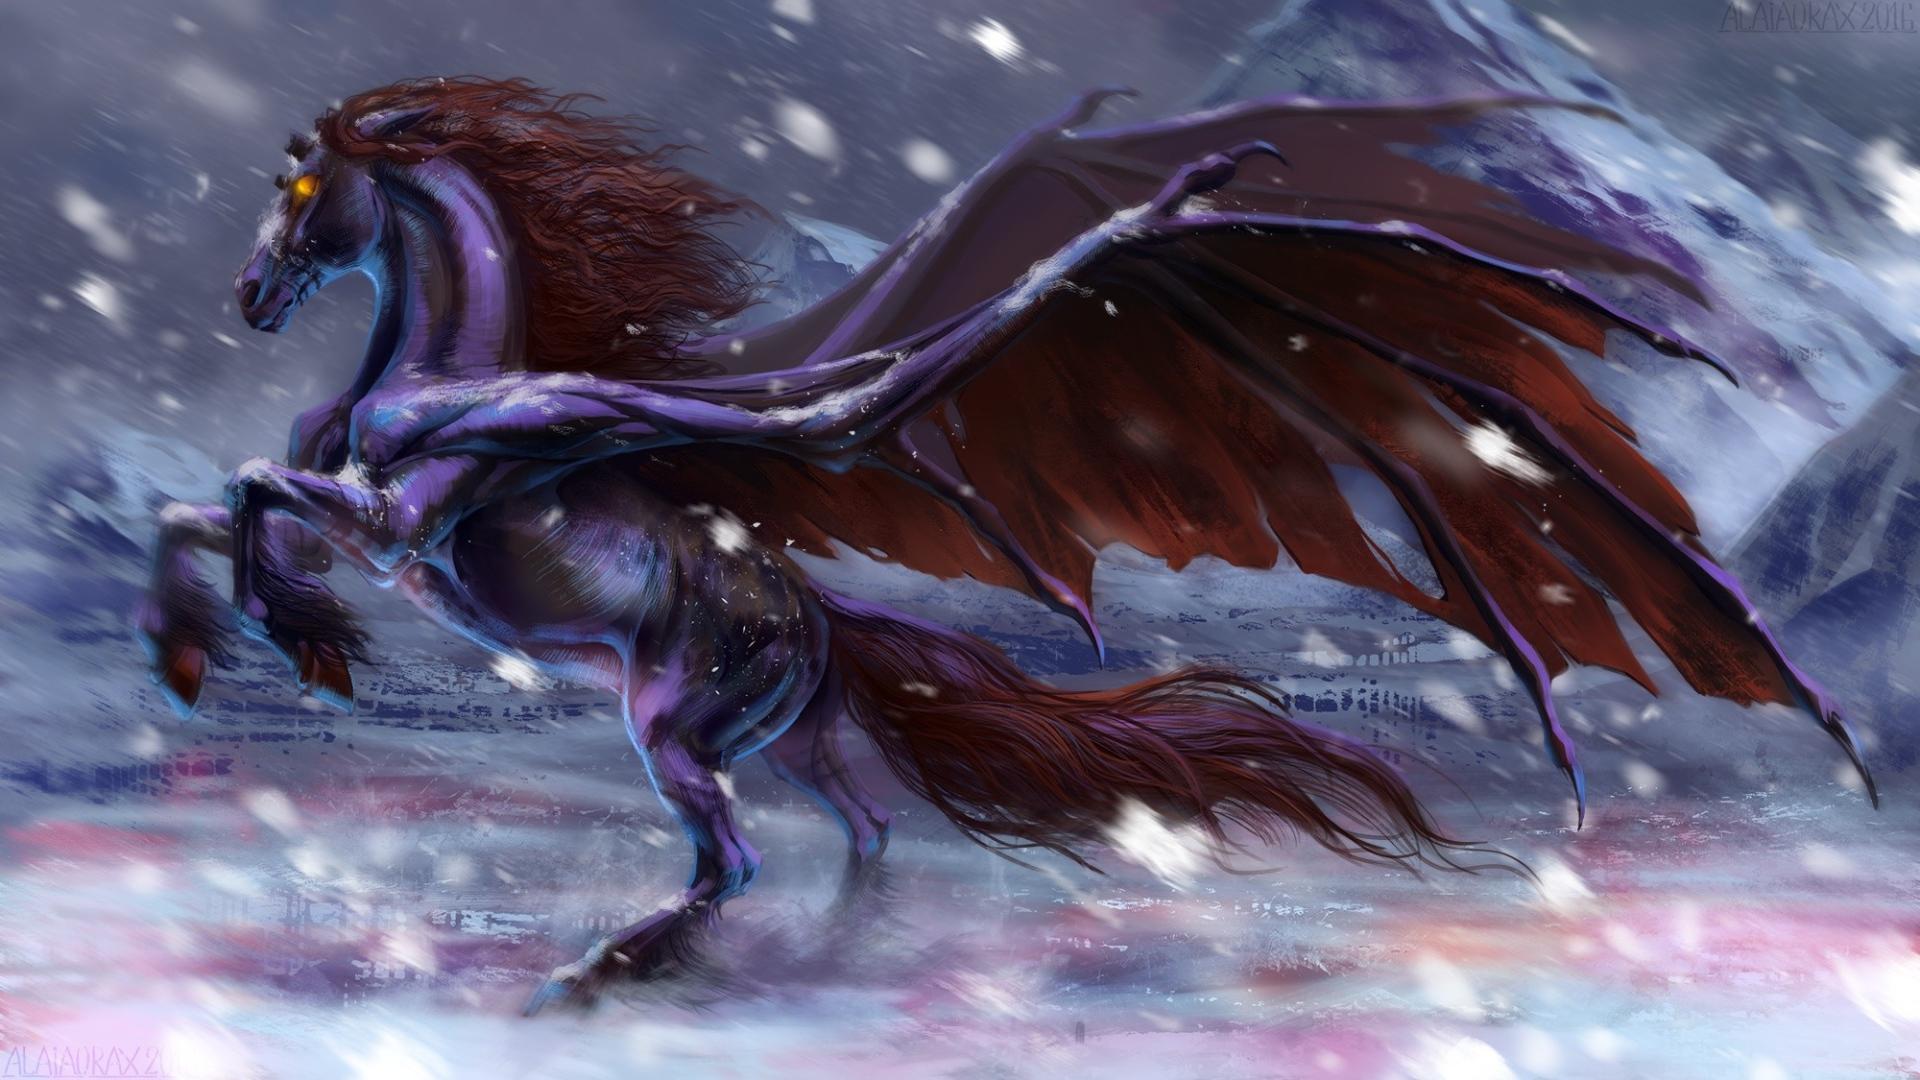 Fantastic Black Horse With Wings Desktop Wallpapers 1920x1080